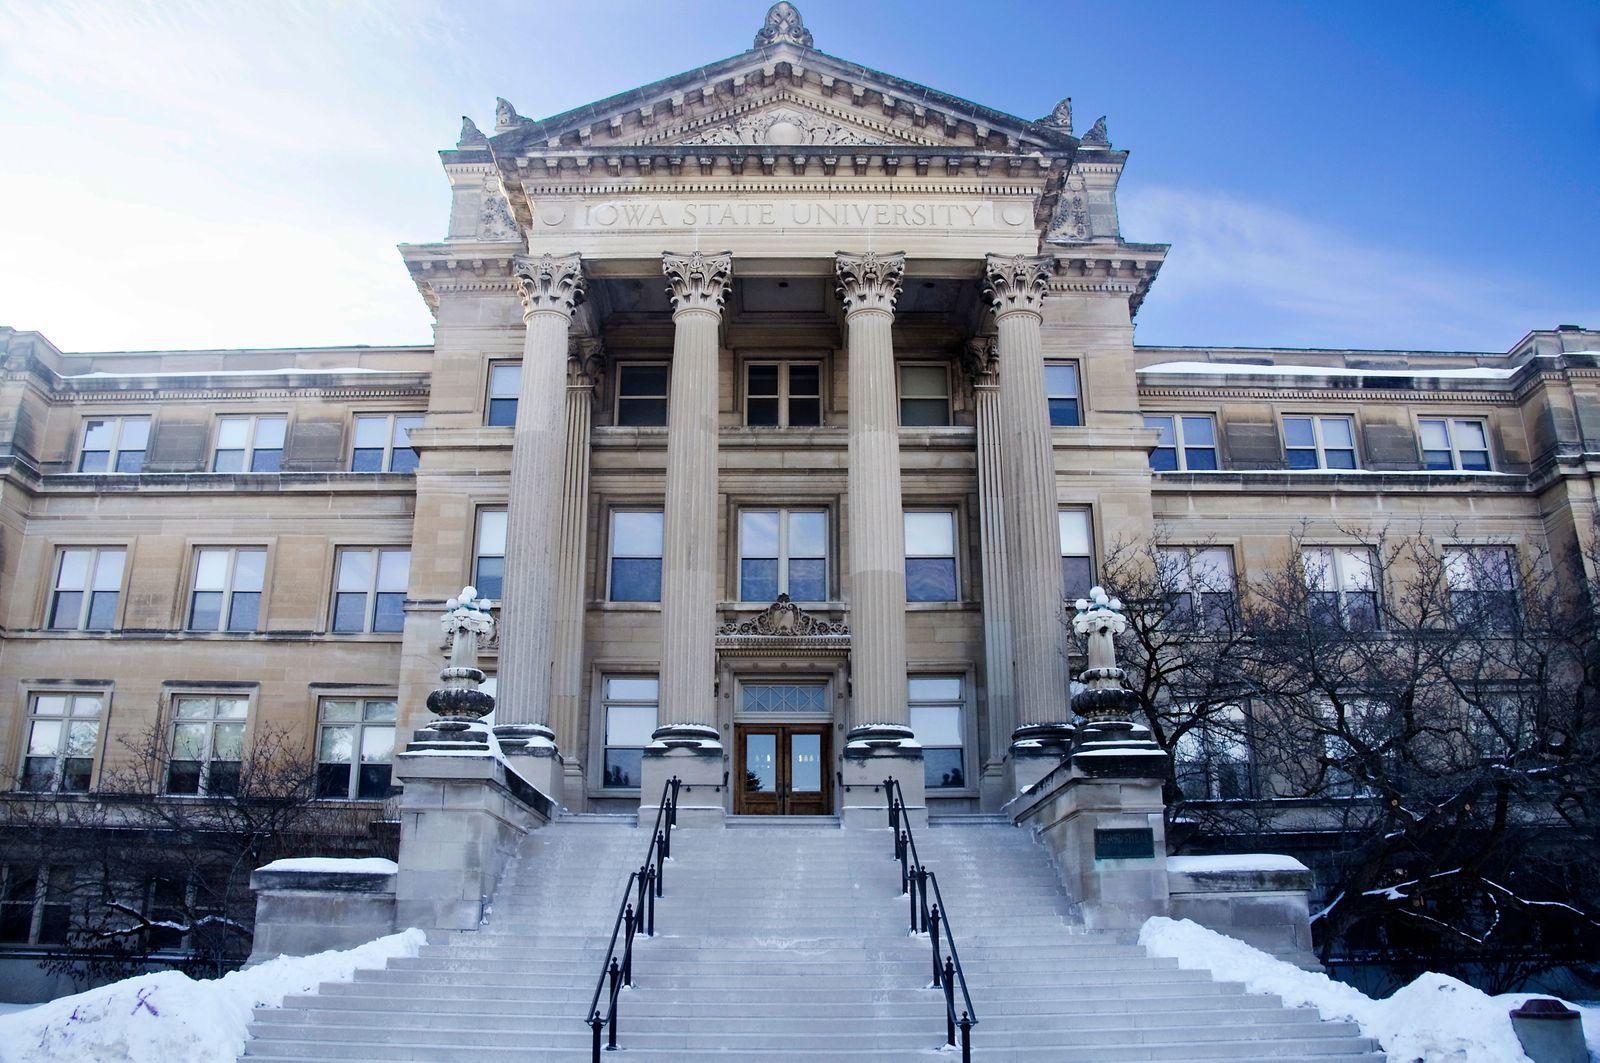 University of Iowa Admissions: ACT Scores, Admit Rate